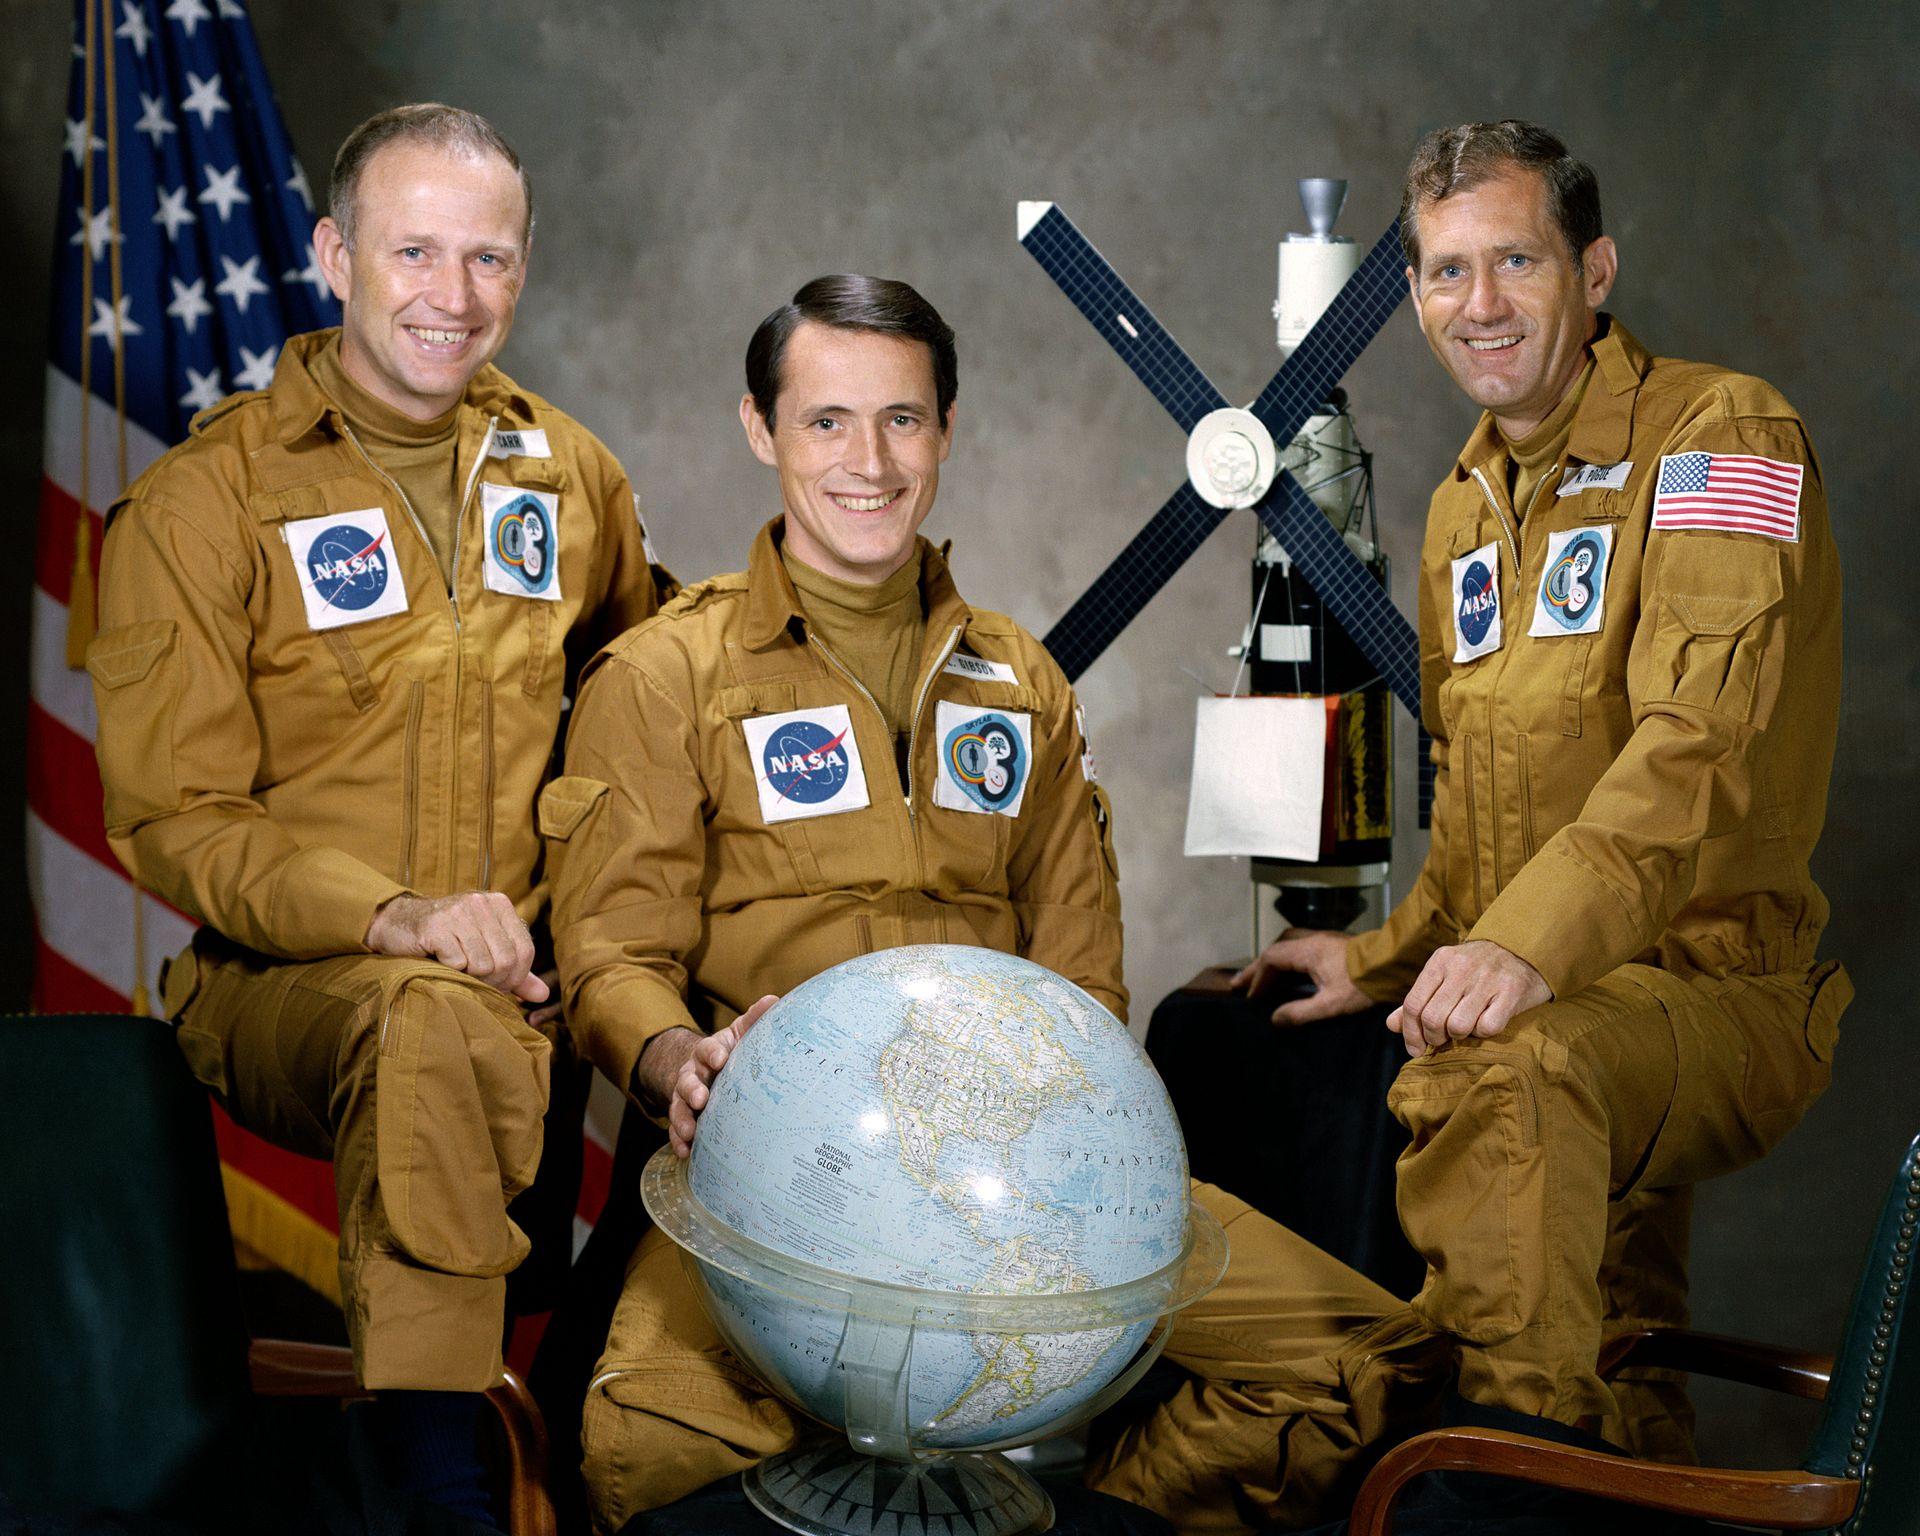 Skylab mutiny - Wikipedia